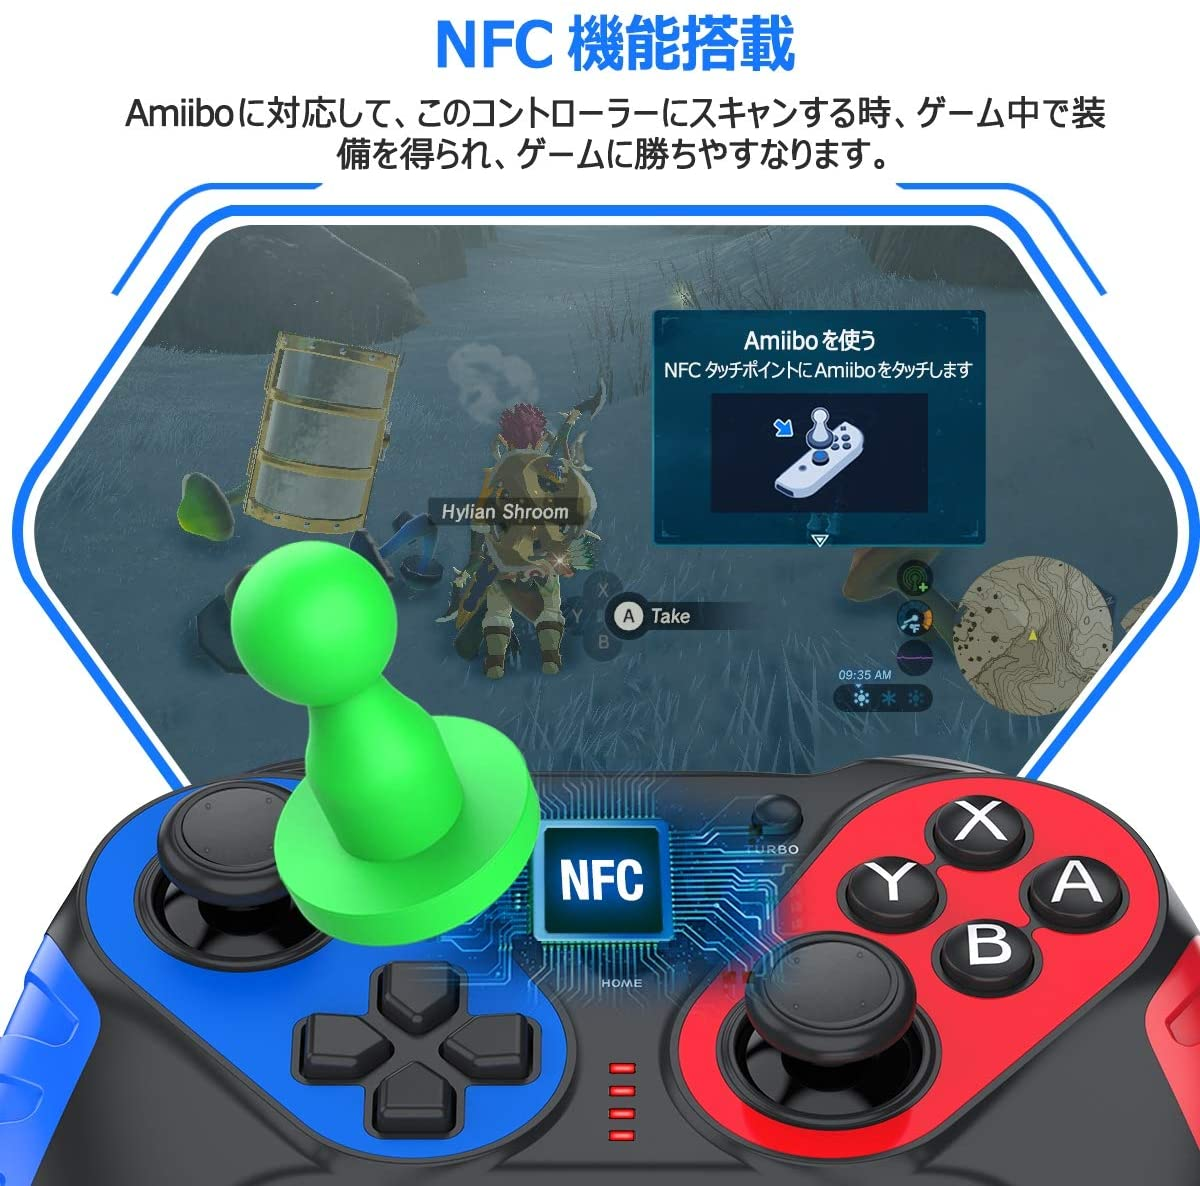 「NFC機能搭載」Switch コントローラー BEBONCOOLスイッチ プロ コントローラー ジャイロセンサー 3段階振動 プロコン 無線 ニンテンドー スイッチ 対応 小型